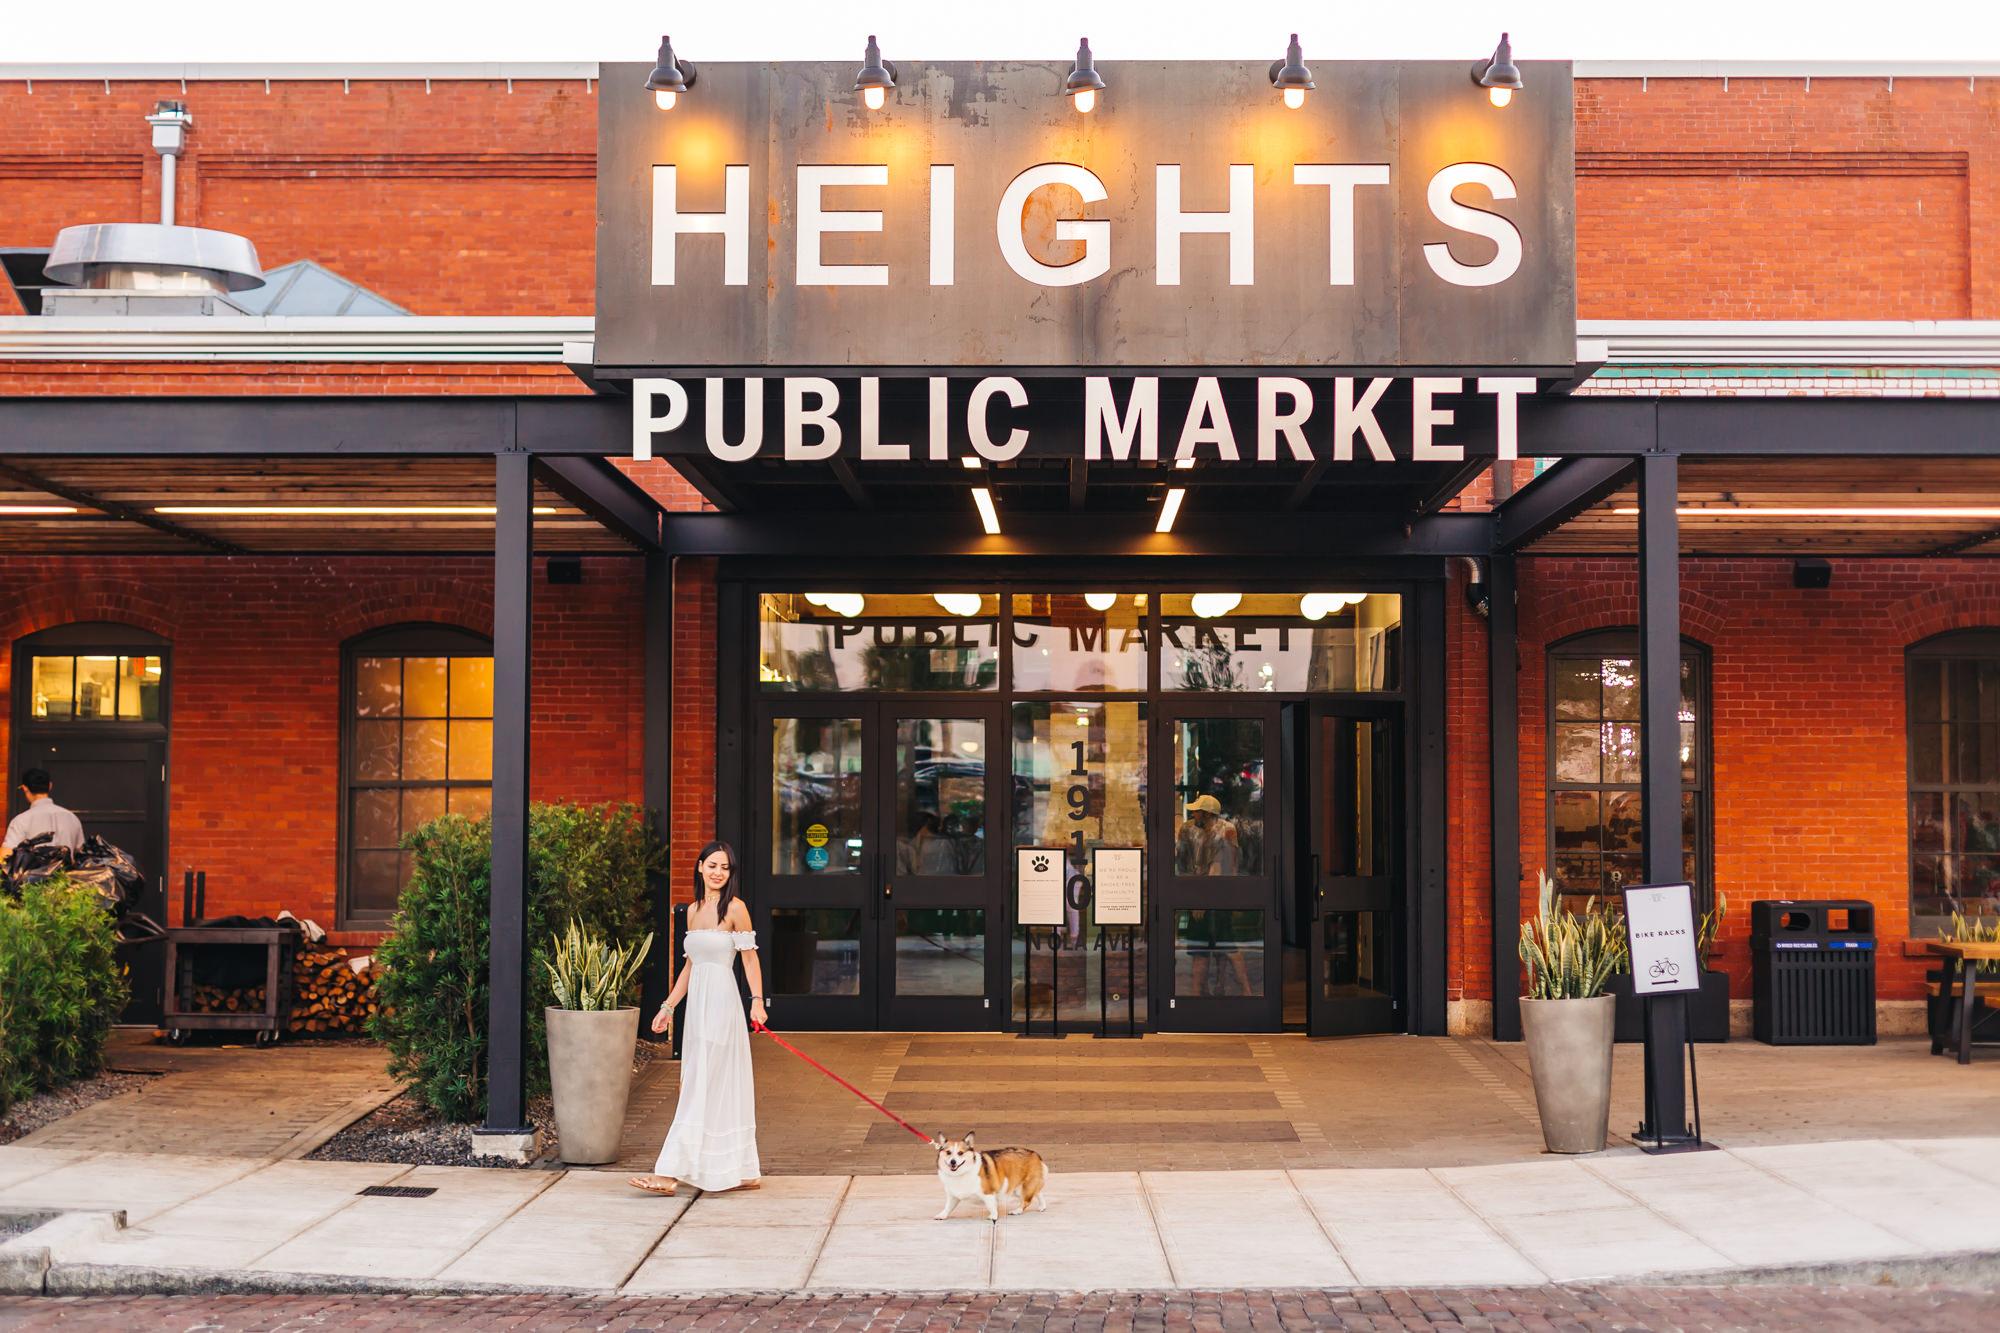 Heights Public Market